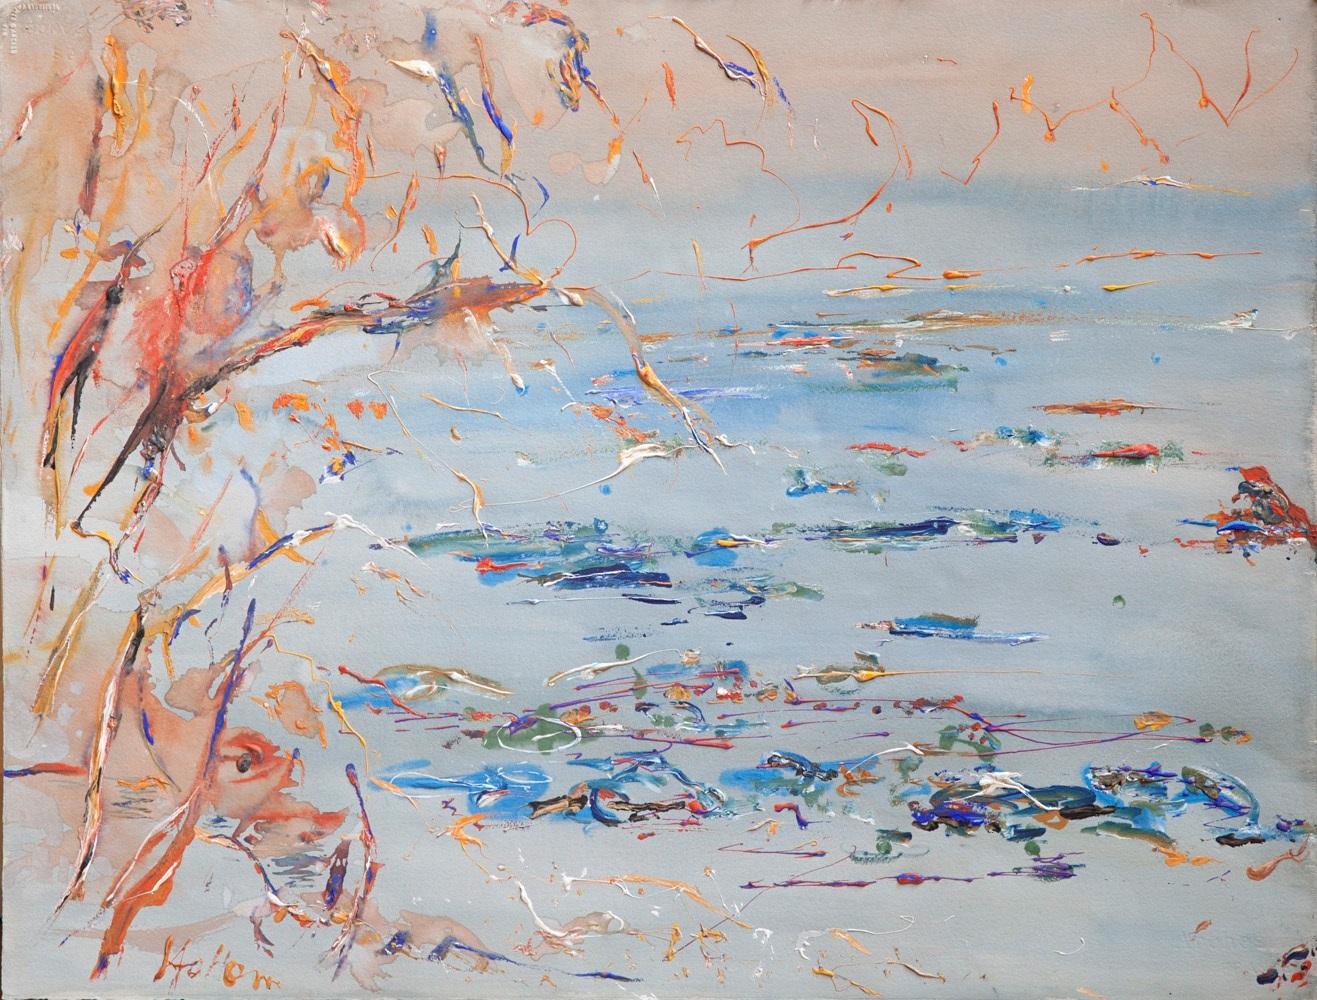 Hal Hattam, High Tide, gouache on paper, 56x75cm $4400